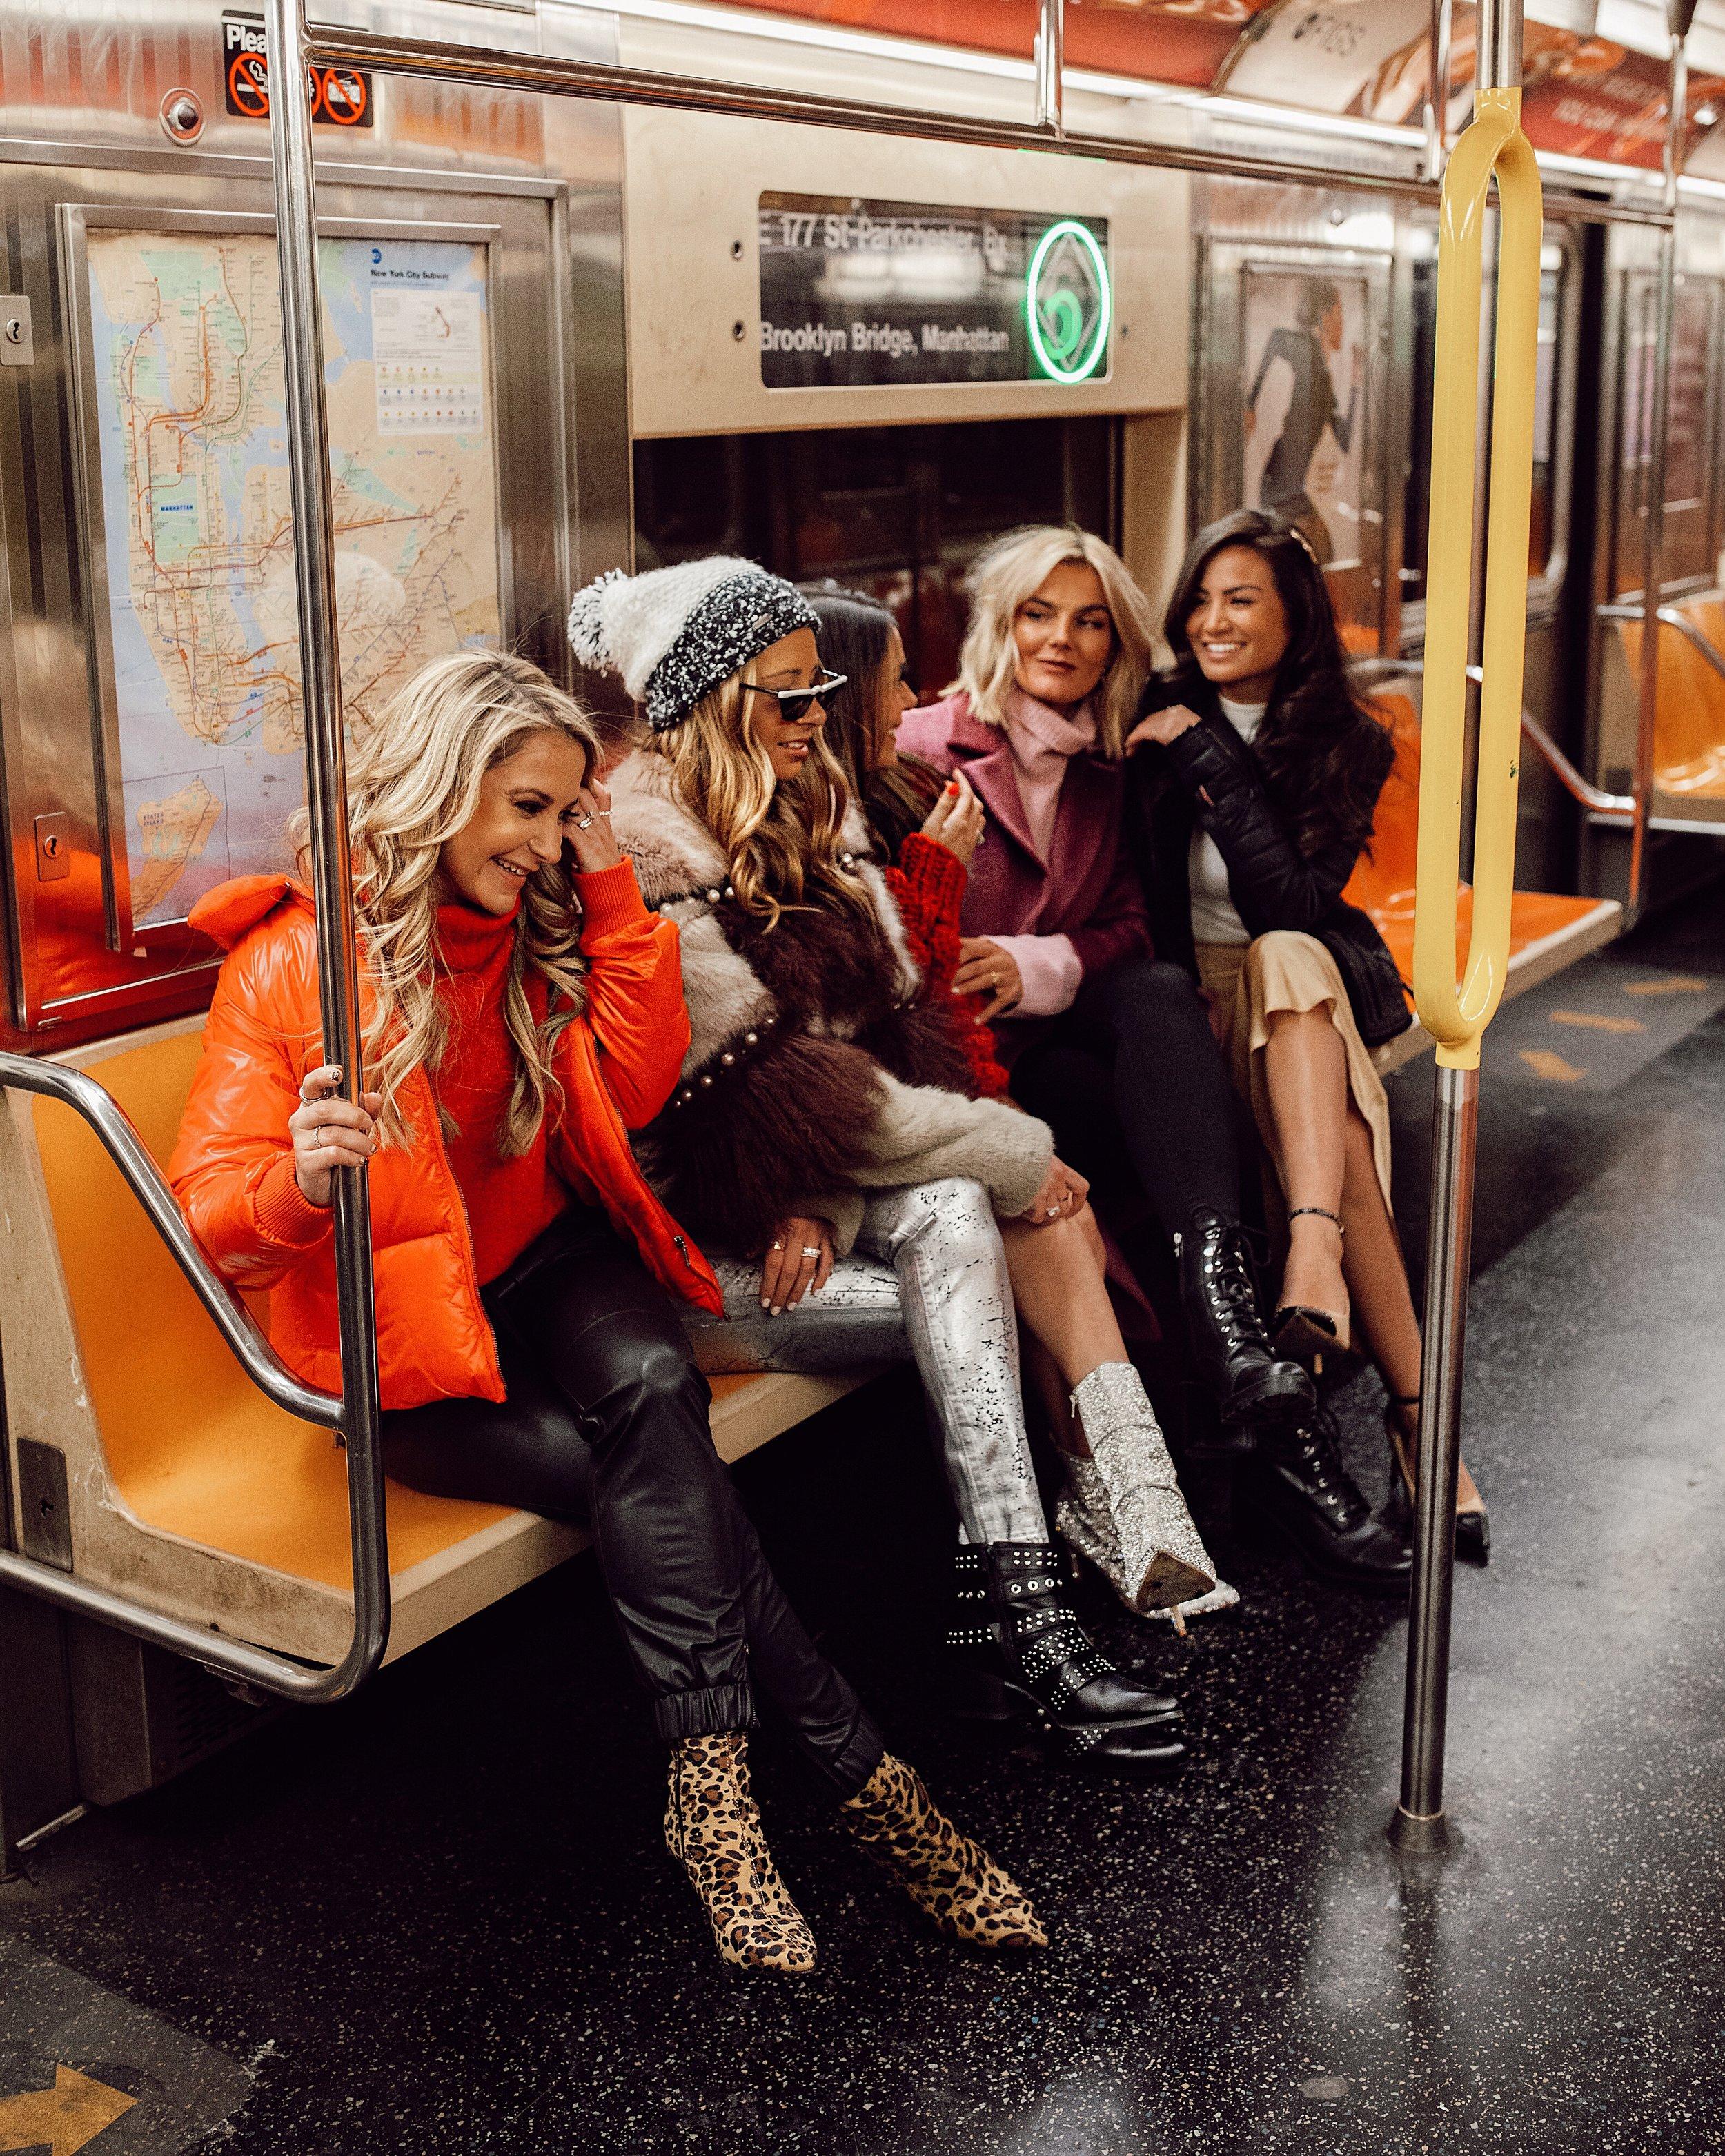 Caila Quinn The Bachelor New York City DSW Style Squad Shoe Picks December